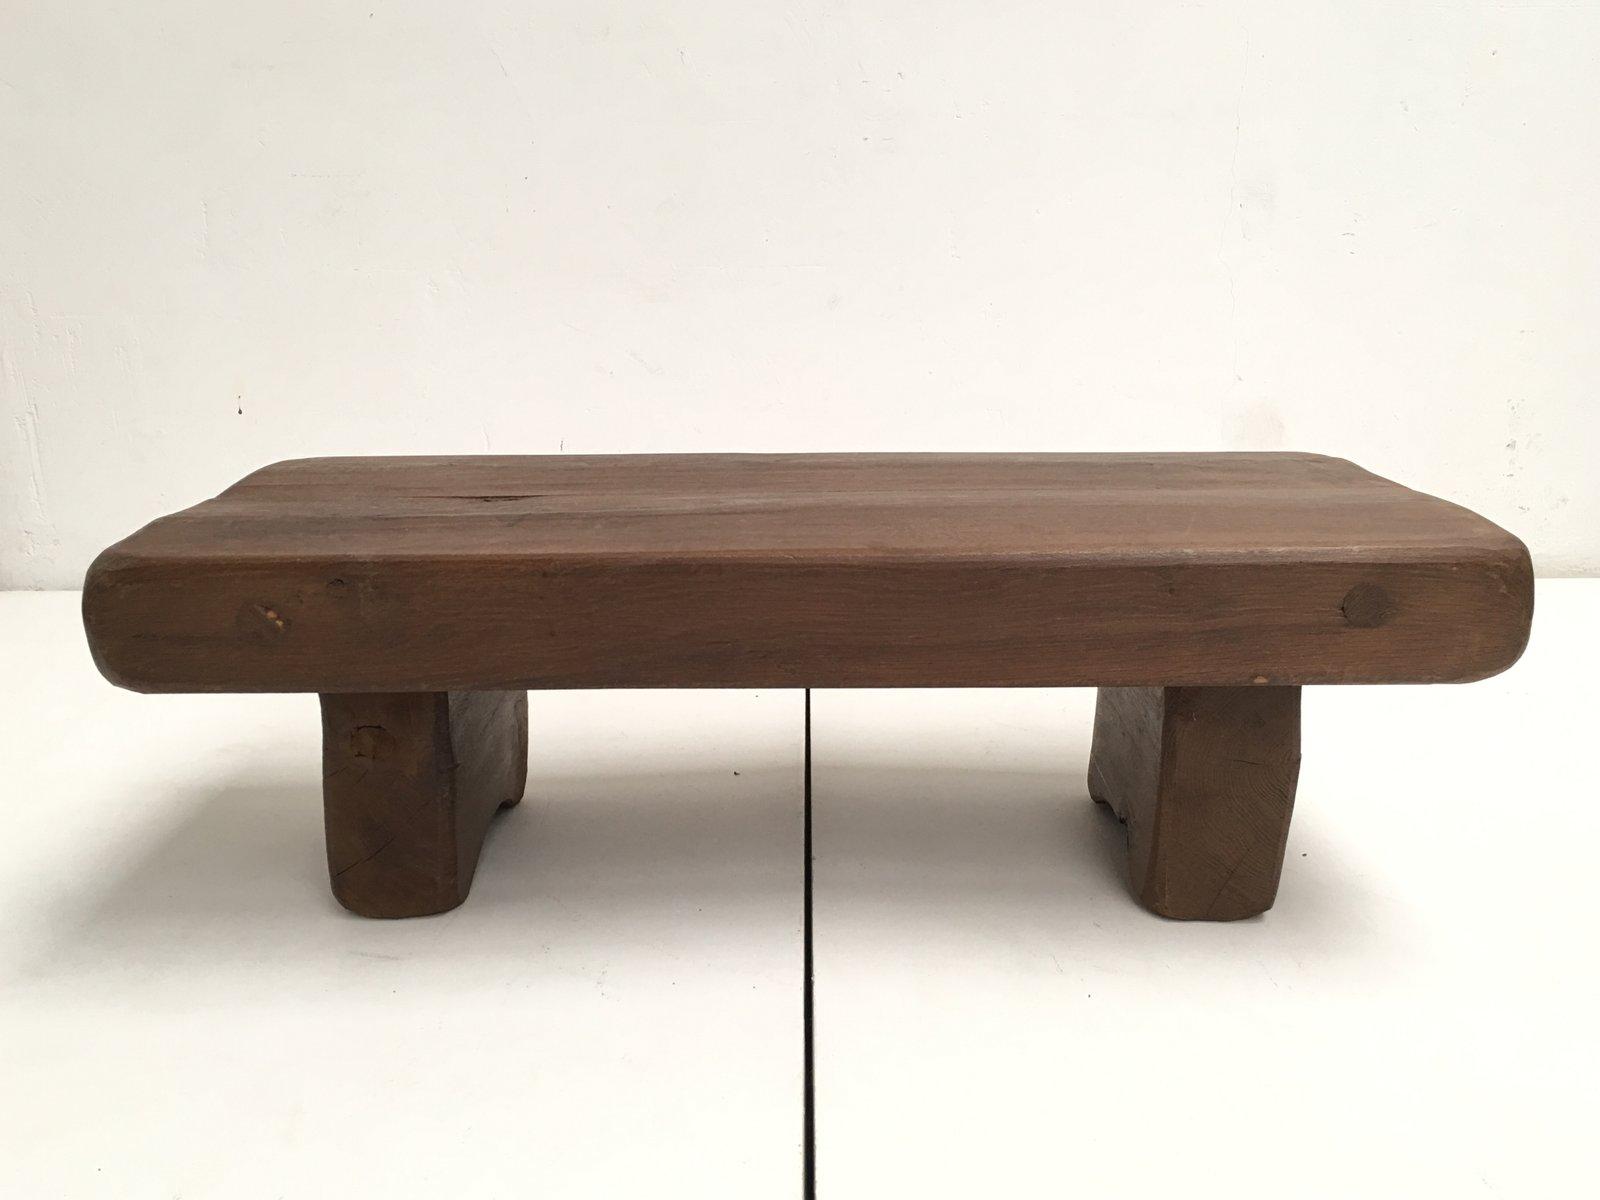 Table basse rustique en ch ne massif france en vente sur pamono - Table basse rustique chene massif ...